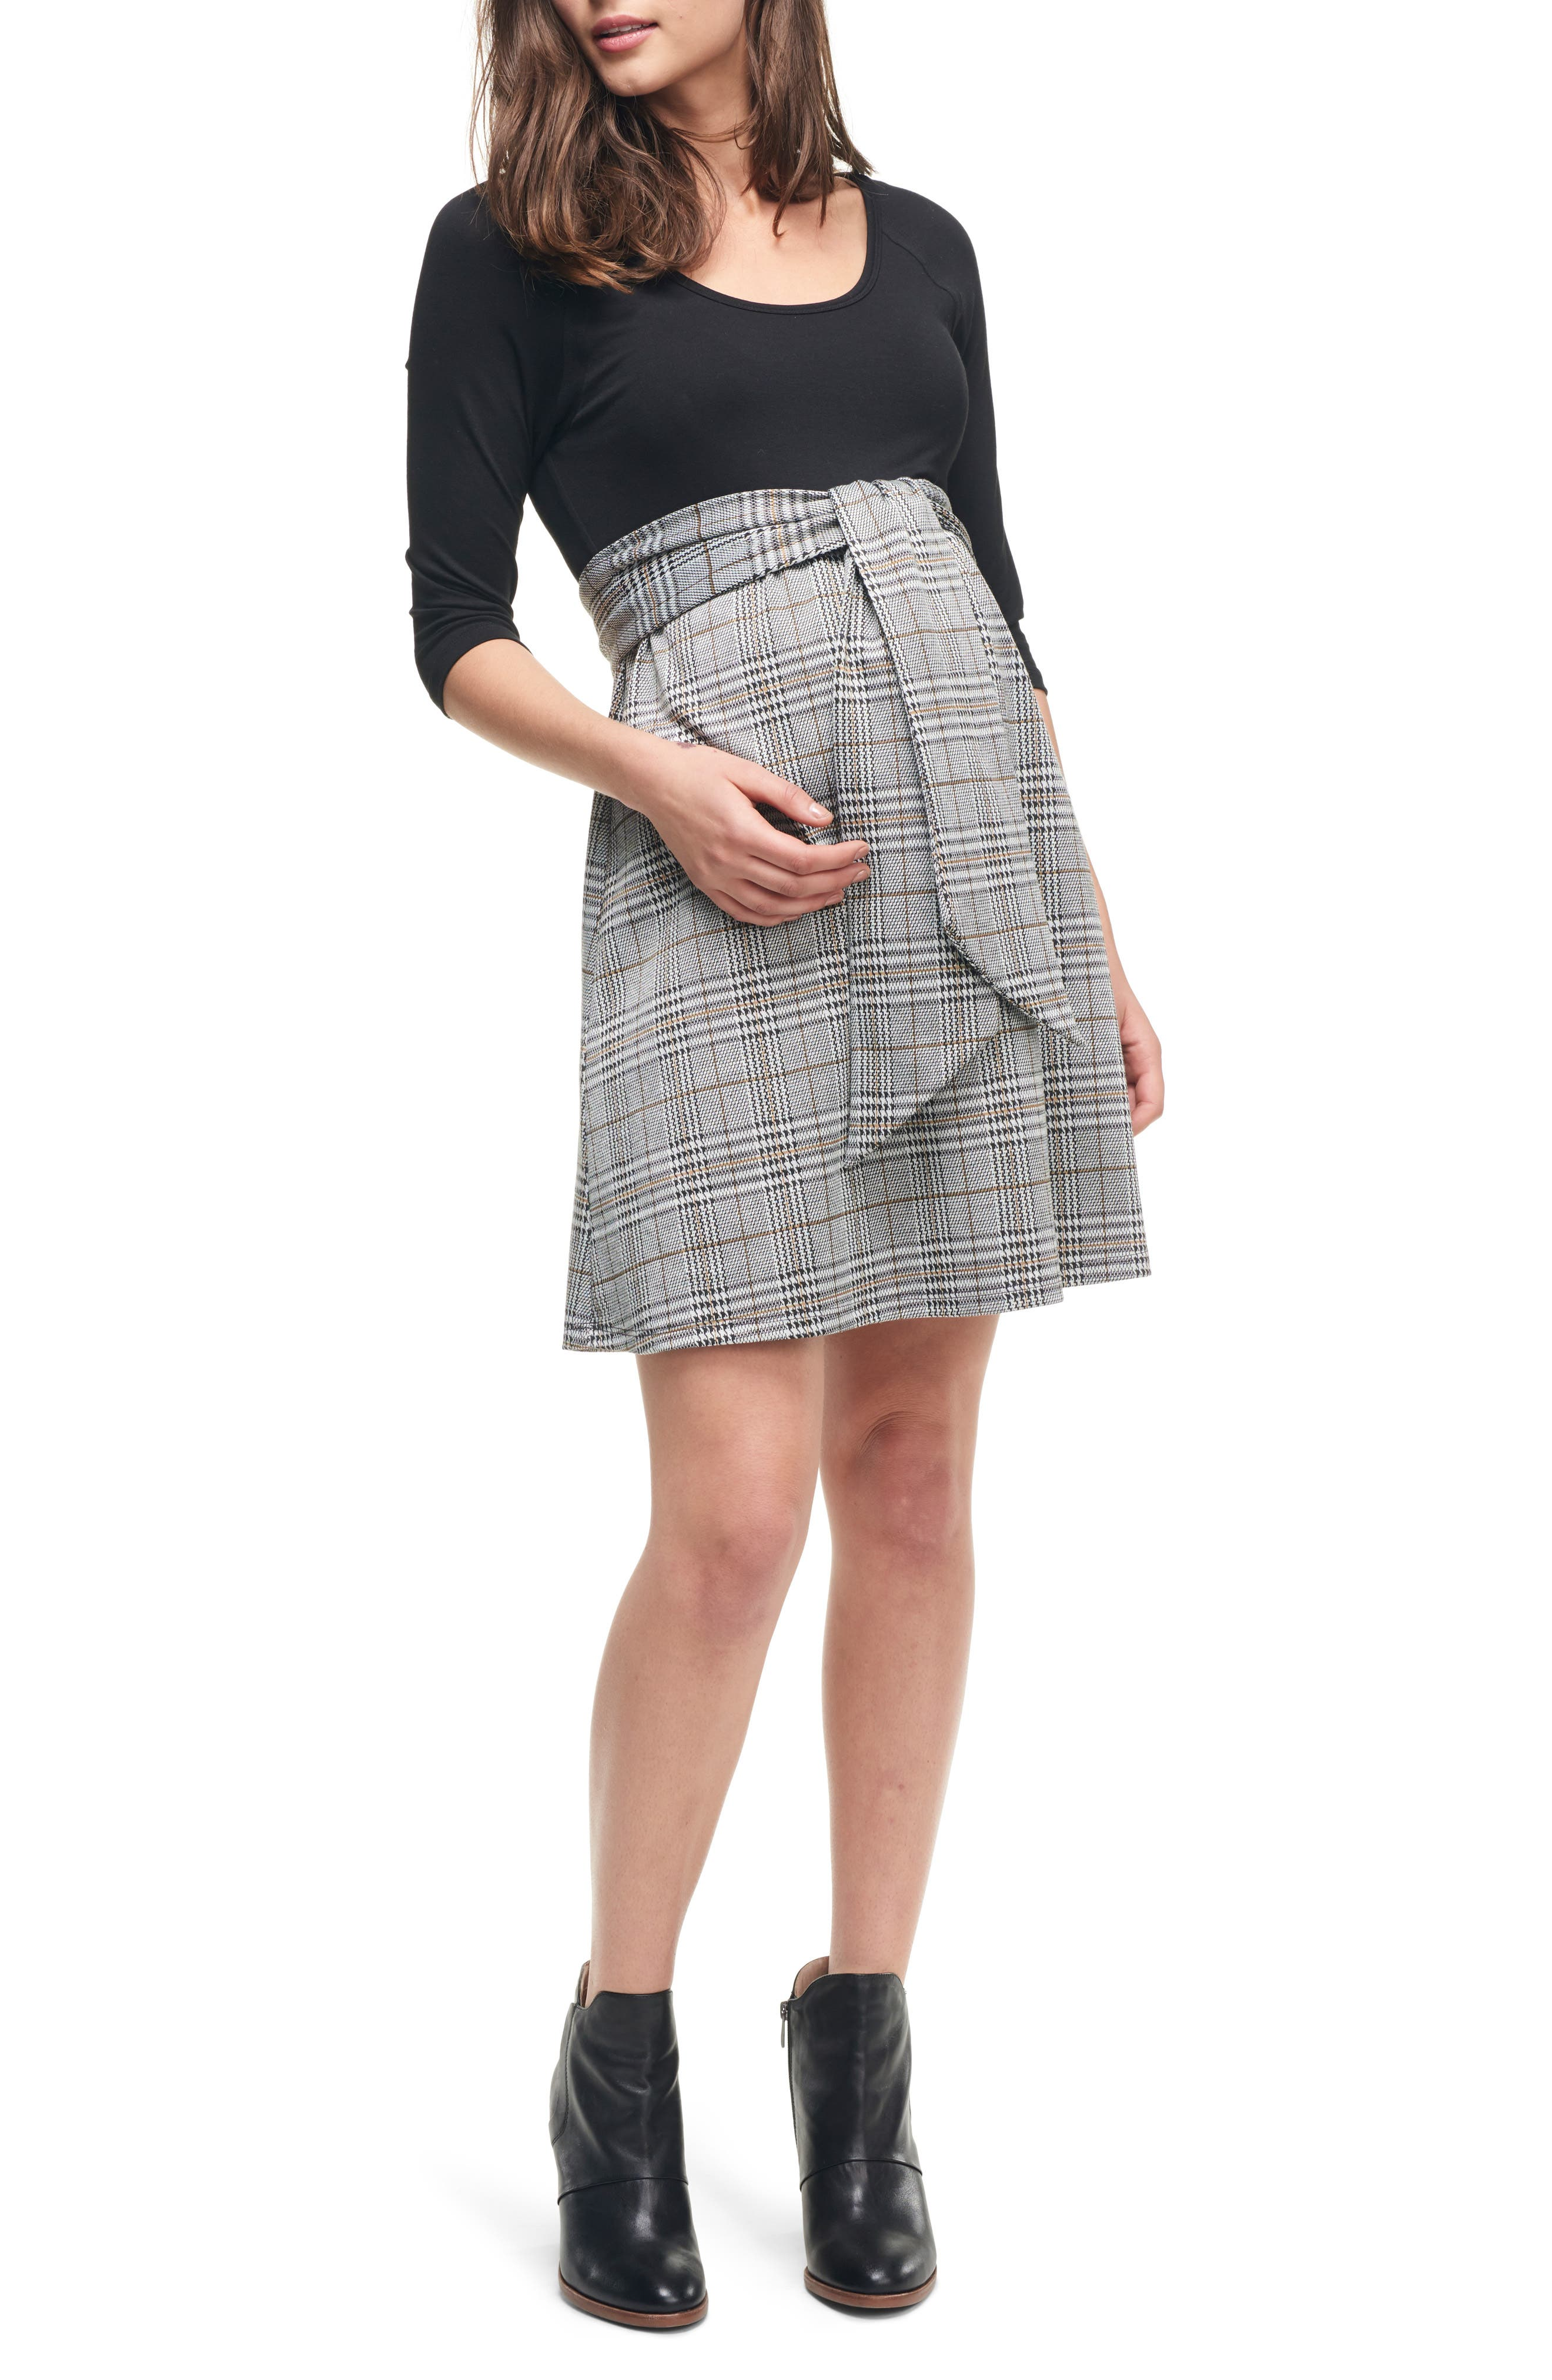 Scoop Neck Maternity Dress,                         Main,                         color, BLACK/ PLAID